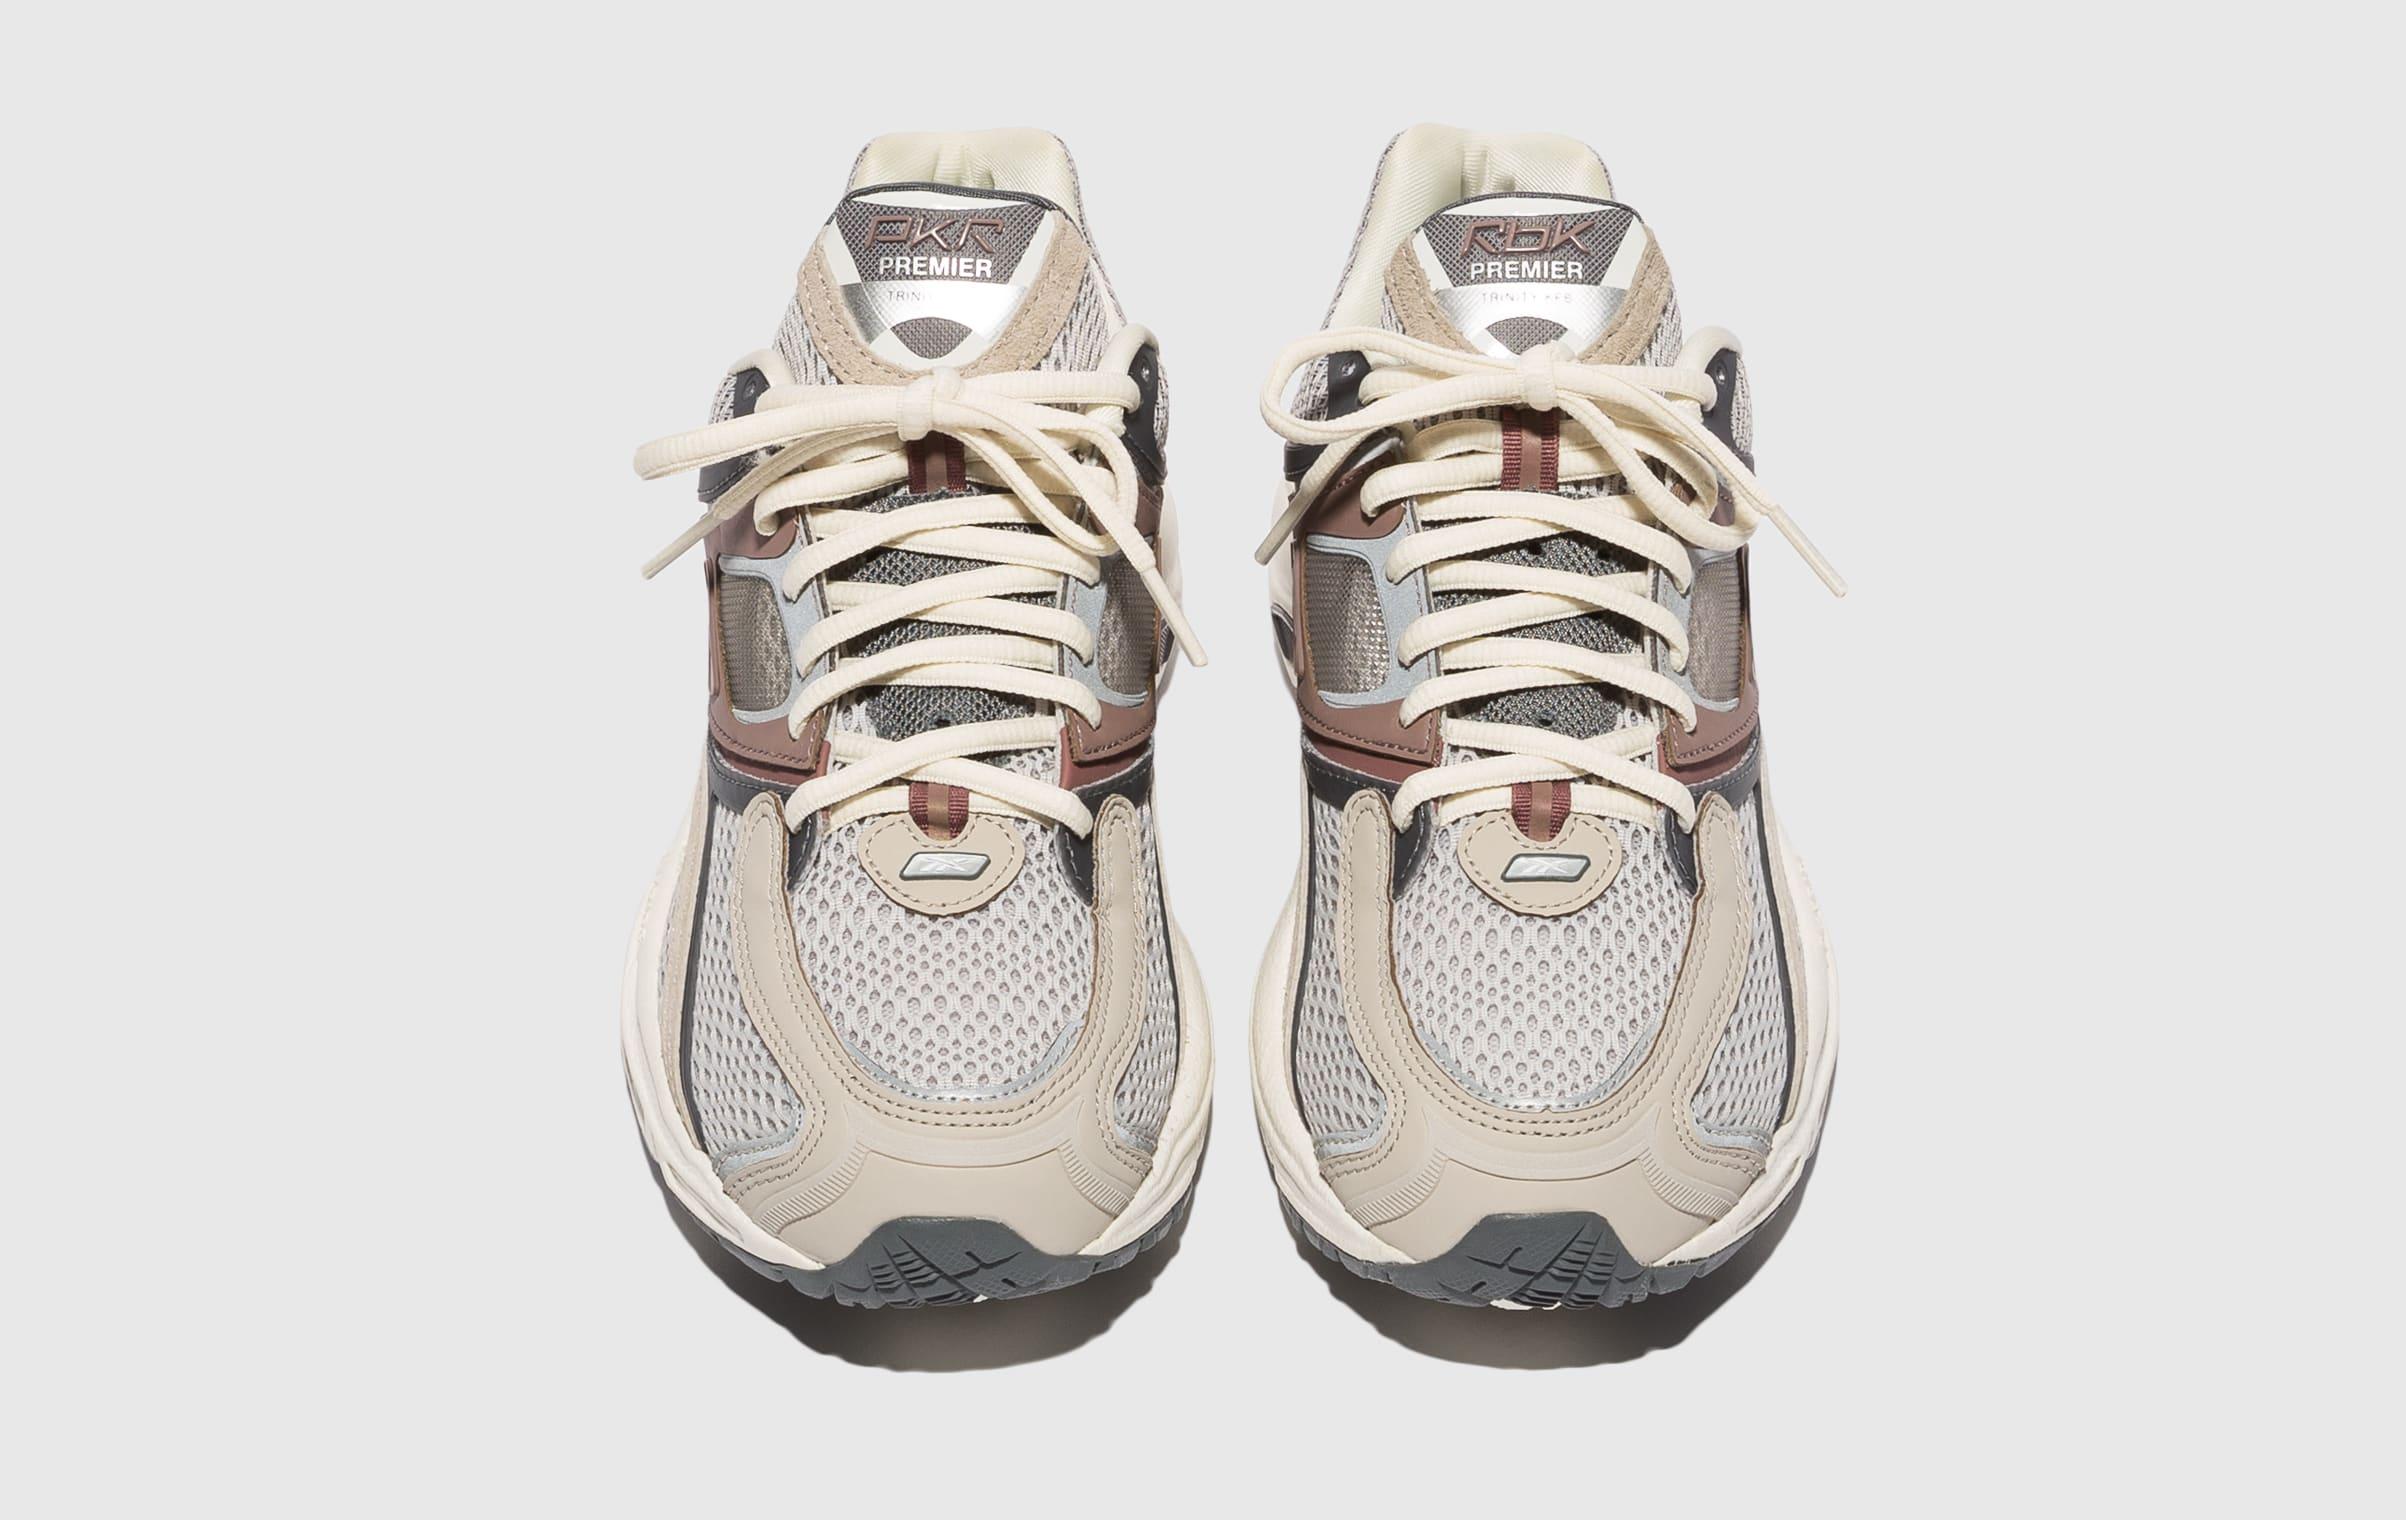 Packer Shoes x Reebok Trinity Premier Cream FY3409 Top